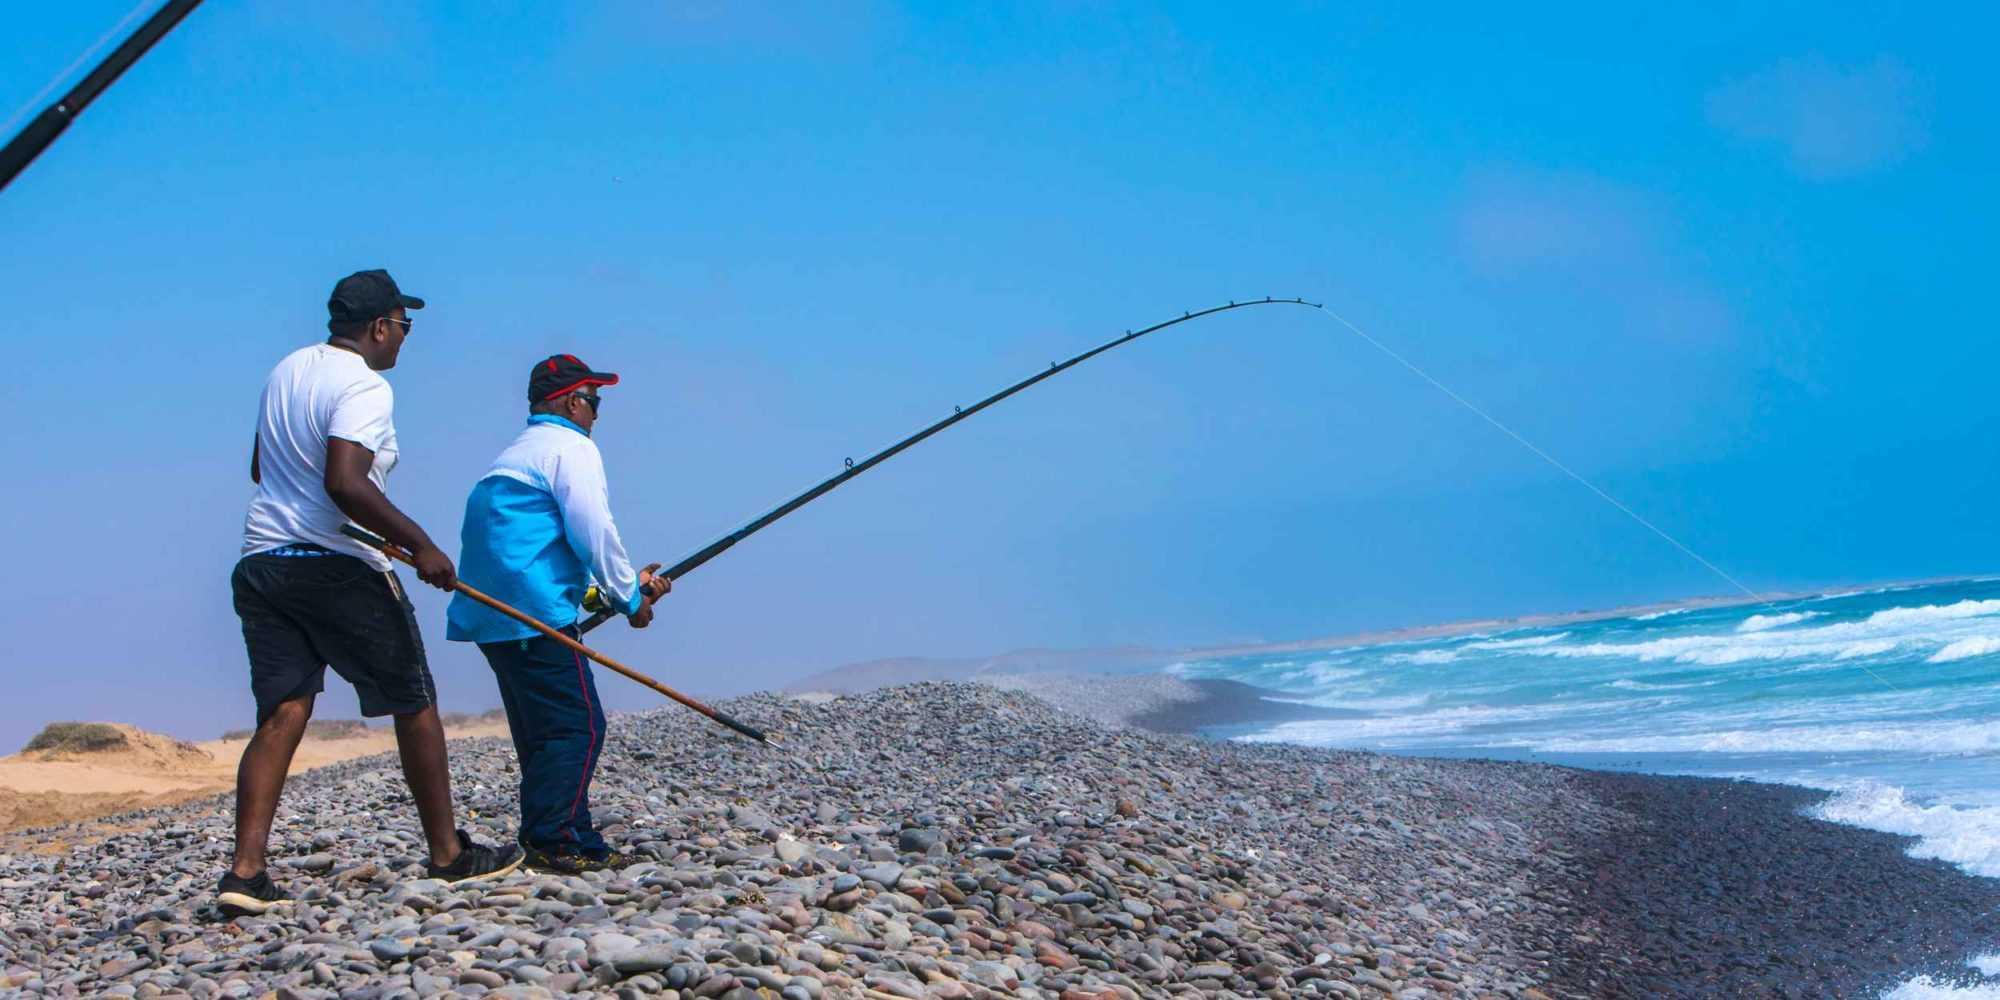 Terrace Bay Fishing 02 © NWR 2018